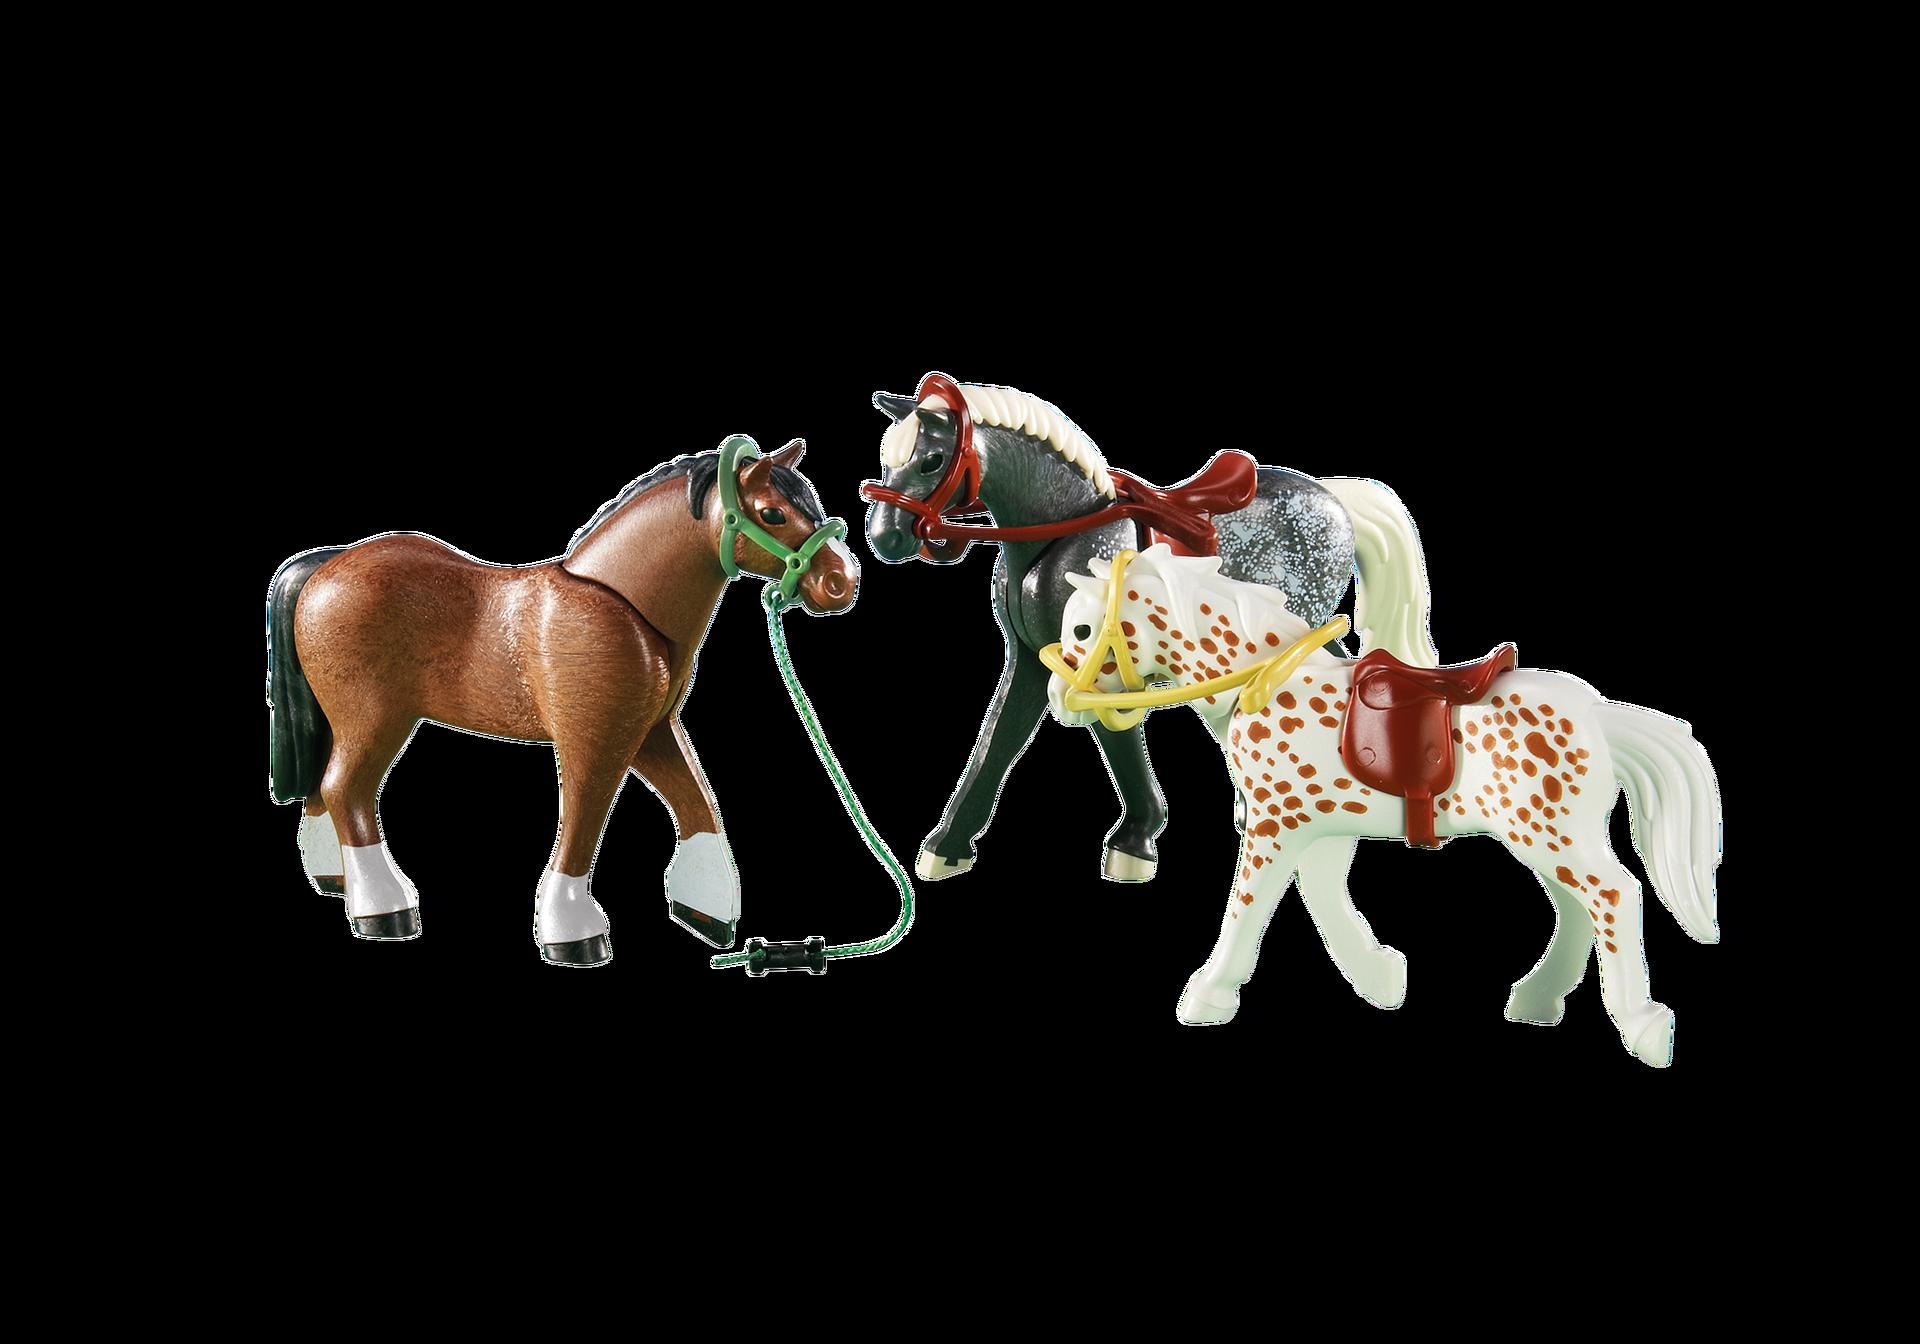 3 horses 6360 playmobil united kingdom for Playmobil pferde set